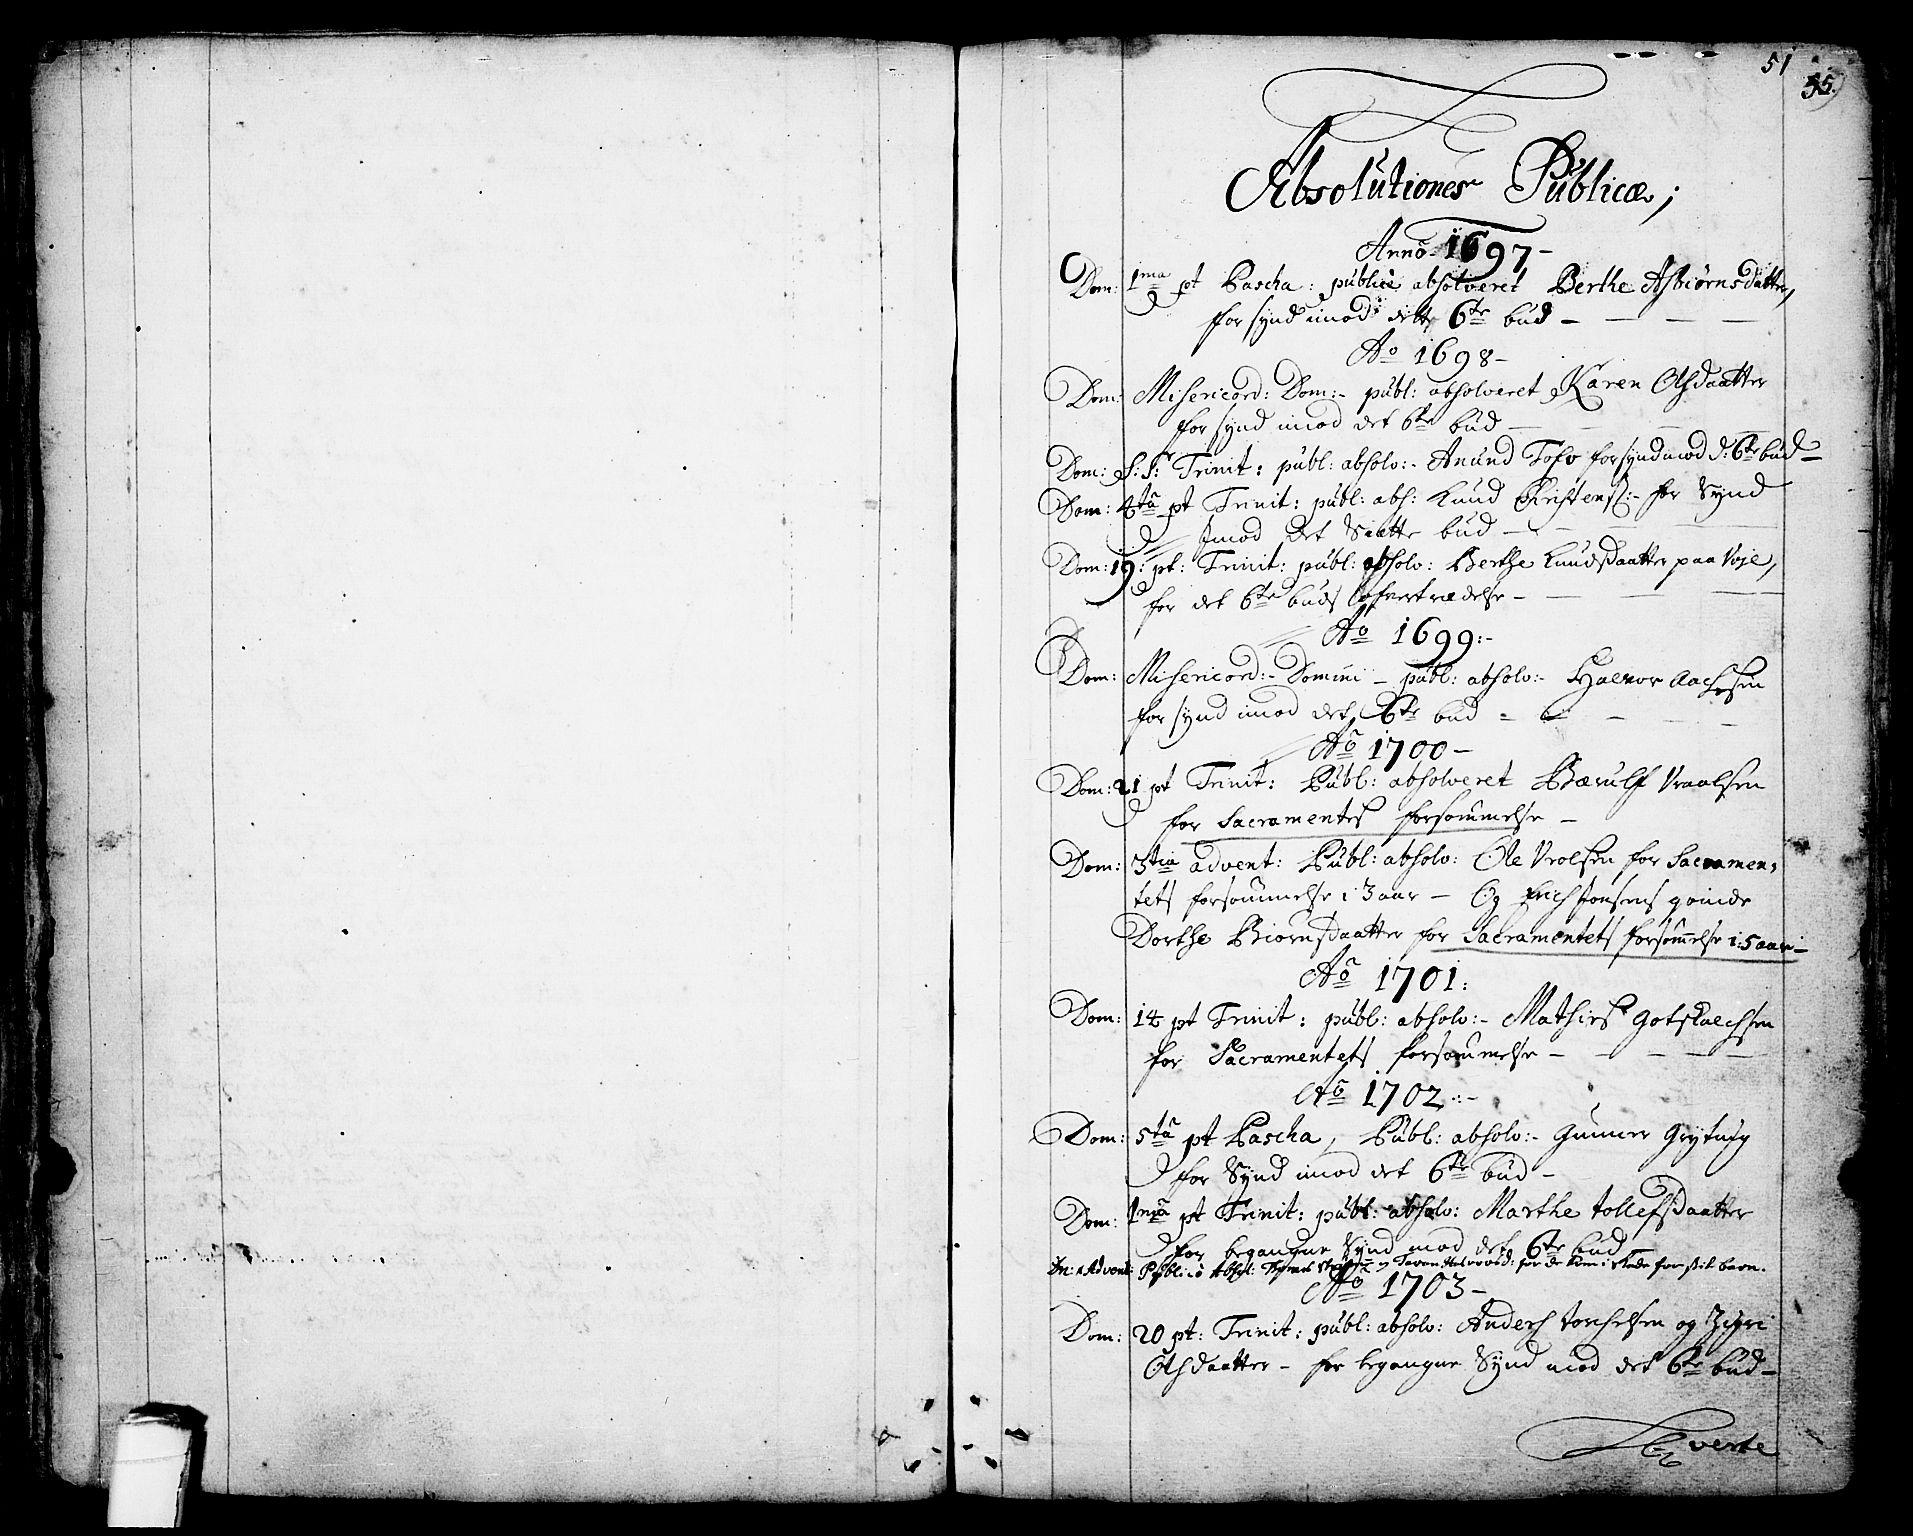 SAKO, Drangedal kirkebøker, F/Fa/L0001: Ministerialbok nr. 1, 1697-1767, s. 51